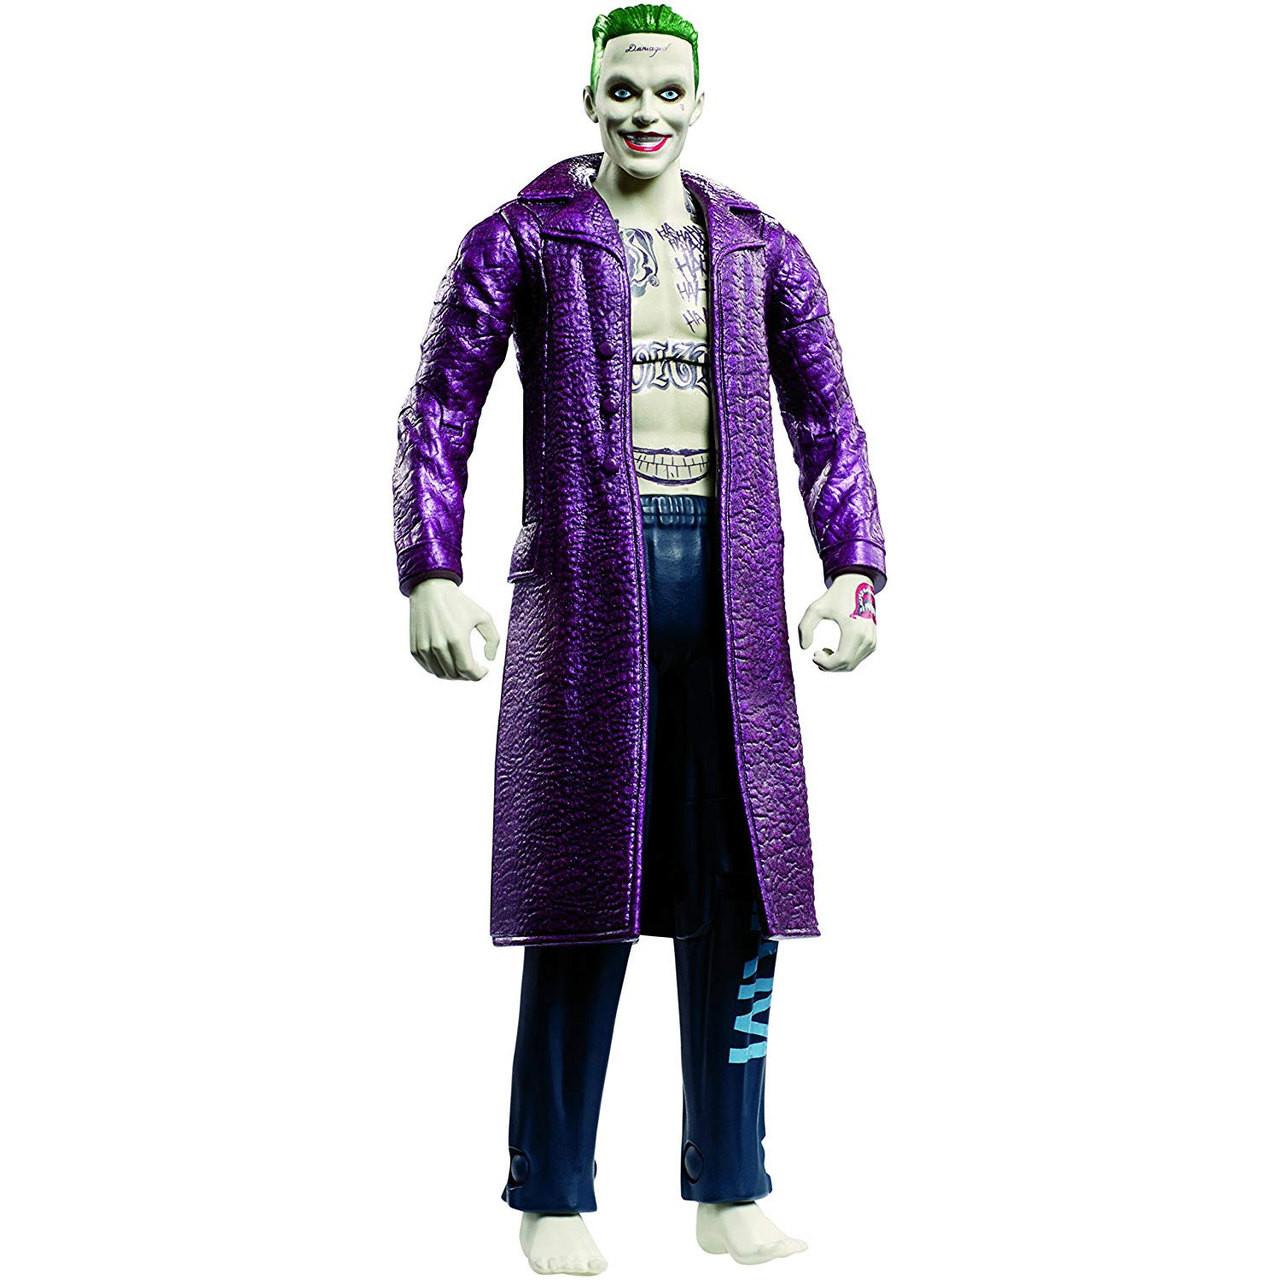 6 Inches Suicide Squad Movie Rick Flag Action Figure DC Comics Multiverse